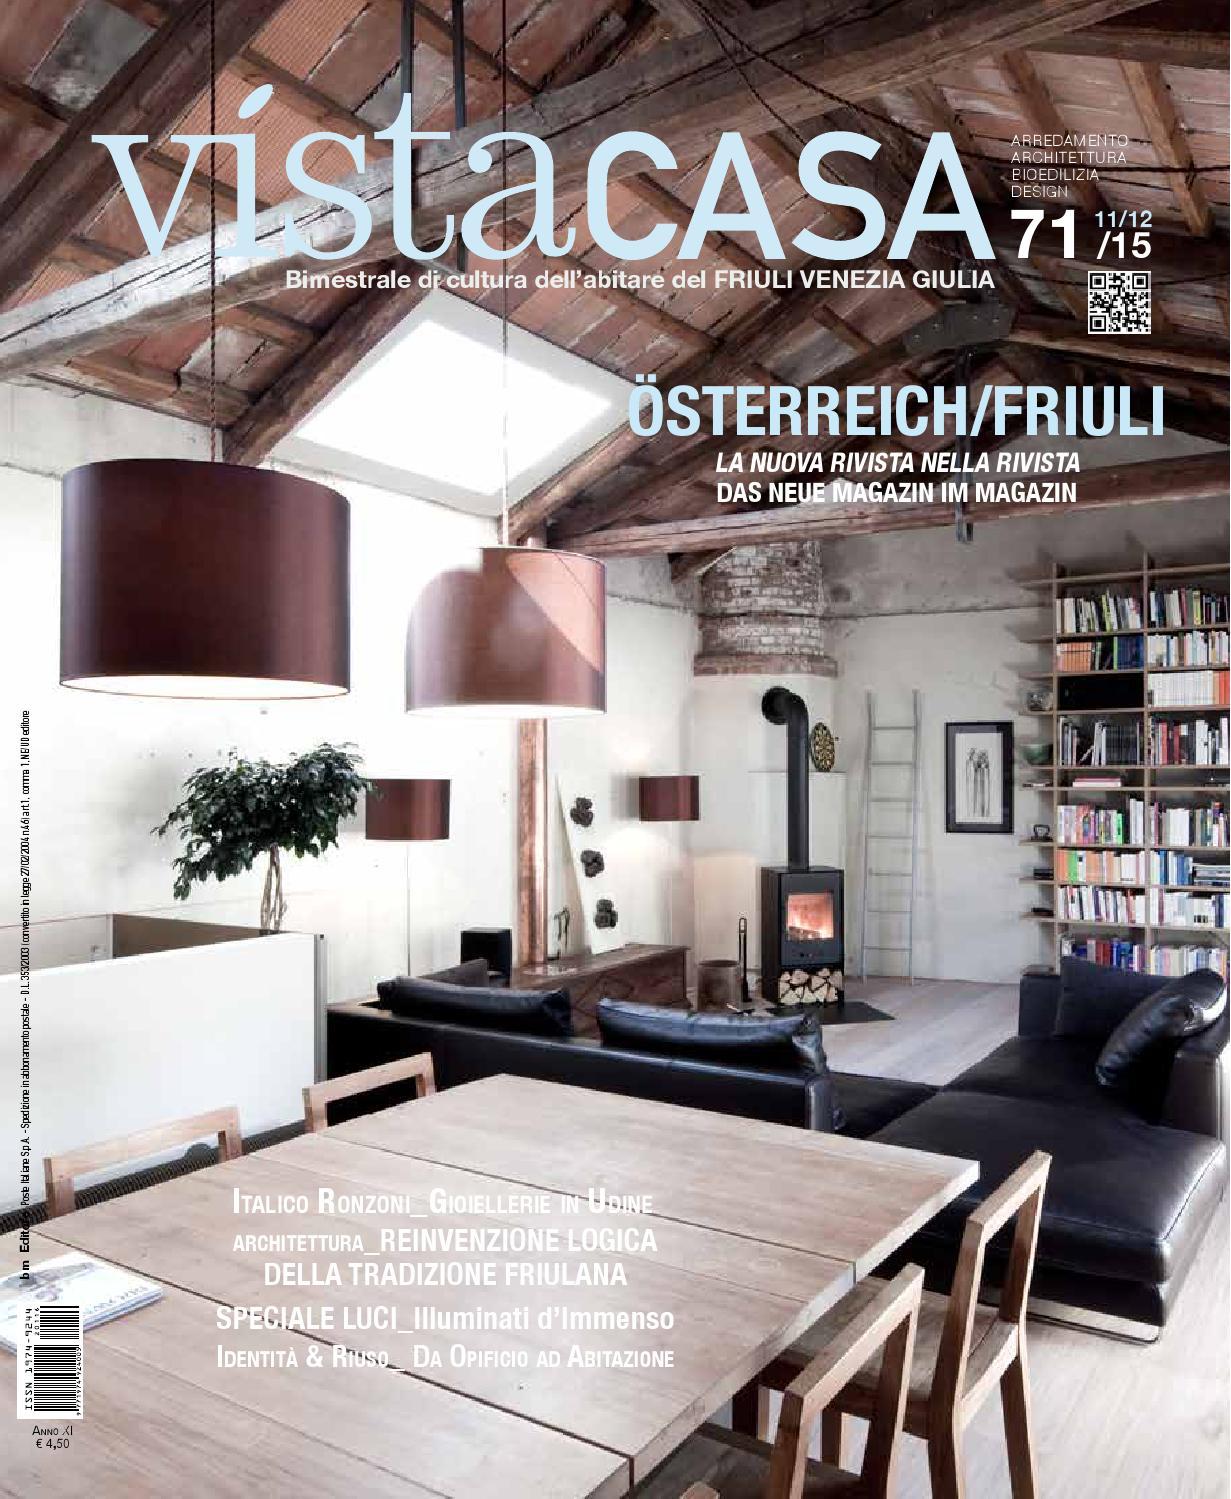 Paoloni Ceramiche Srl Arredo Bagno E Cucine.Vistacasa N 71 By Vistacasa By Bm Editore Issuu